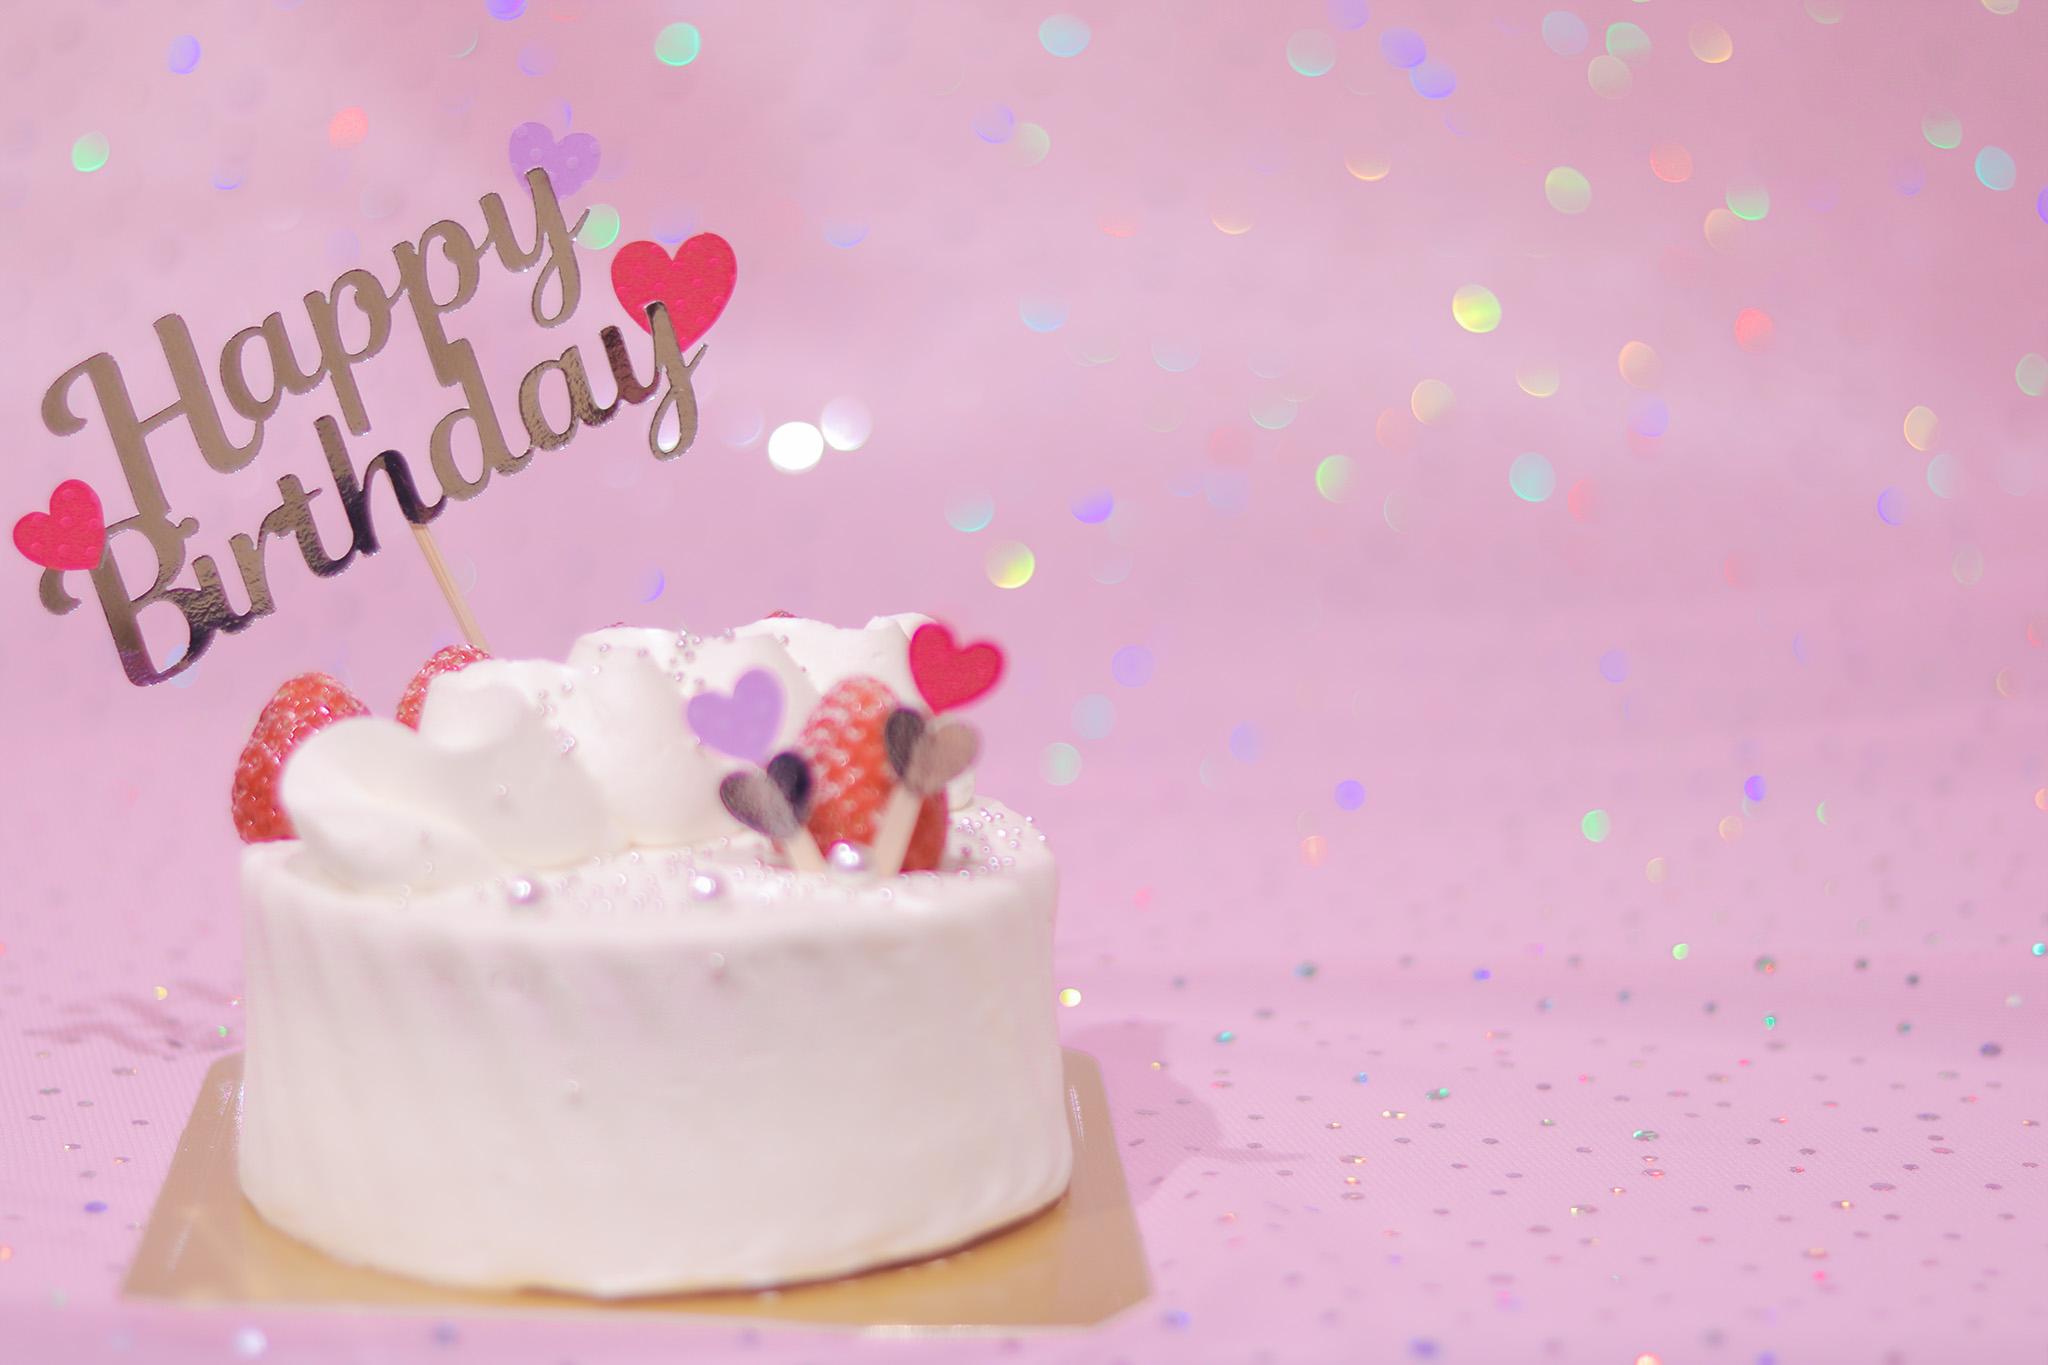 「HAPPY BIRTHDAY」「おめでとう」「お祝い」「お誕生日おめでとう」「ケーキ」「ケーキトッパー」「縦長画像」「誕生日ケーキ」などがテーマのフリー写真画像